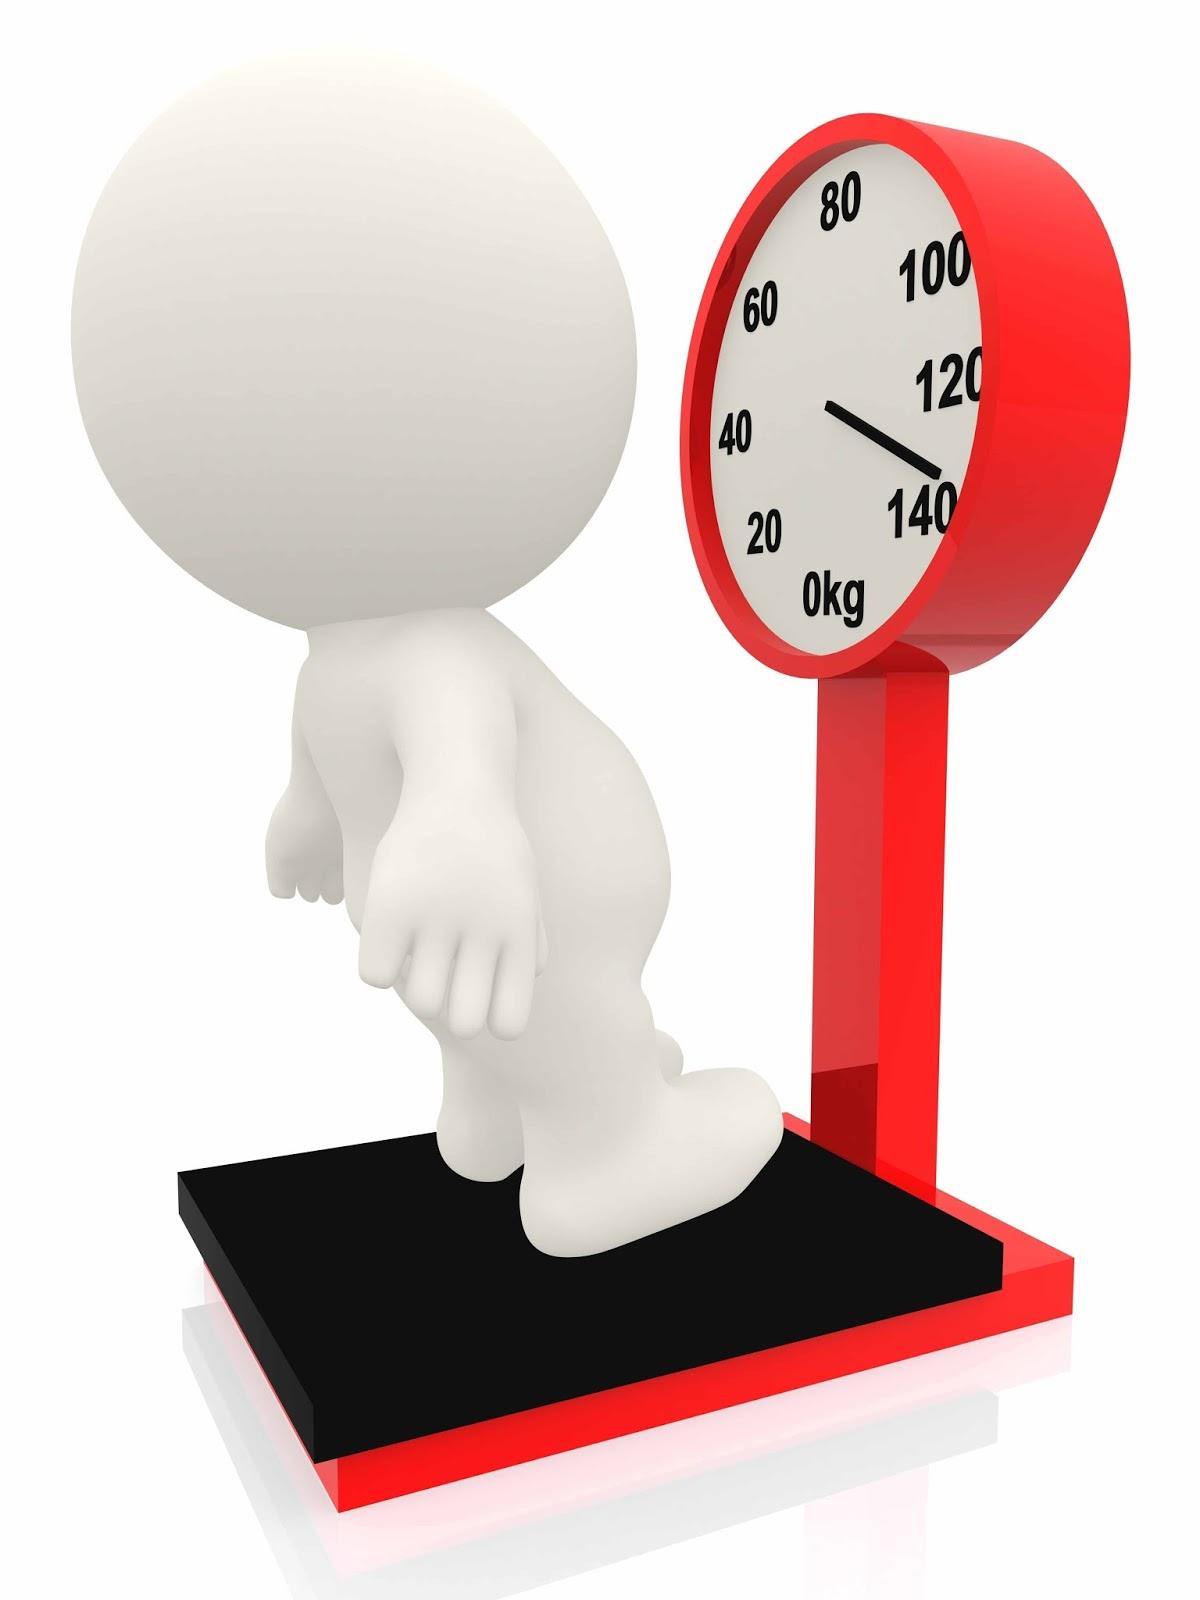 Dieta diaria para bajar de peso sanamente